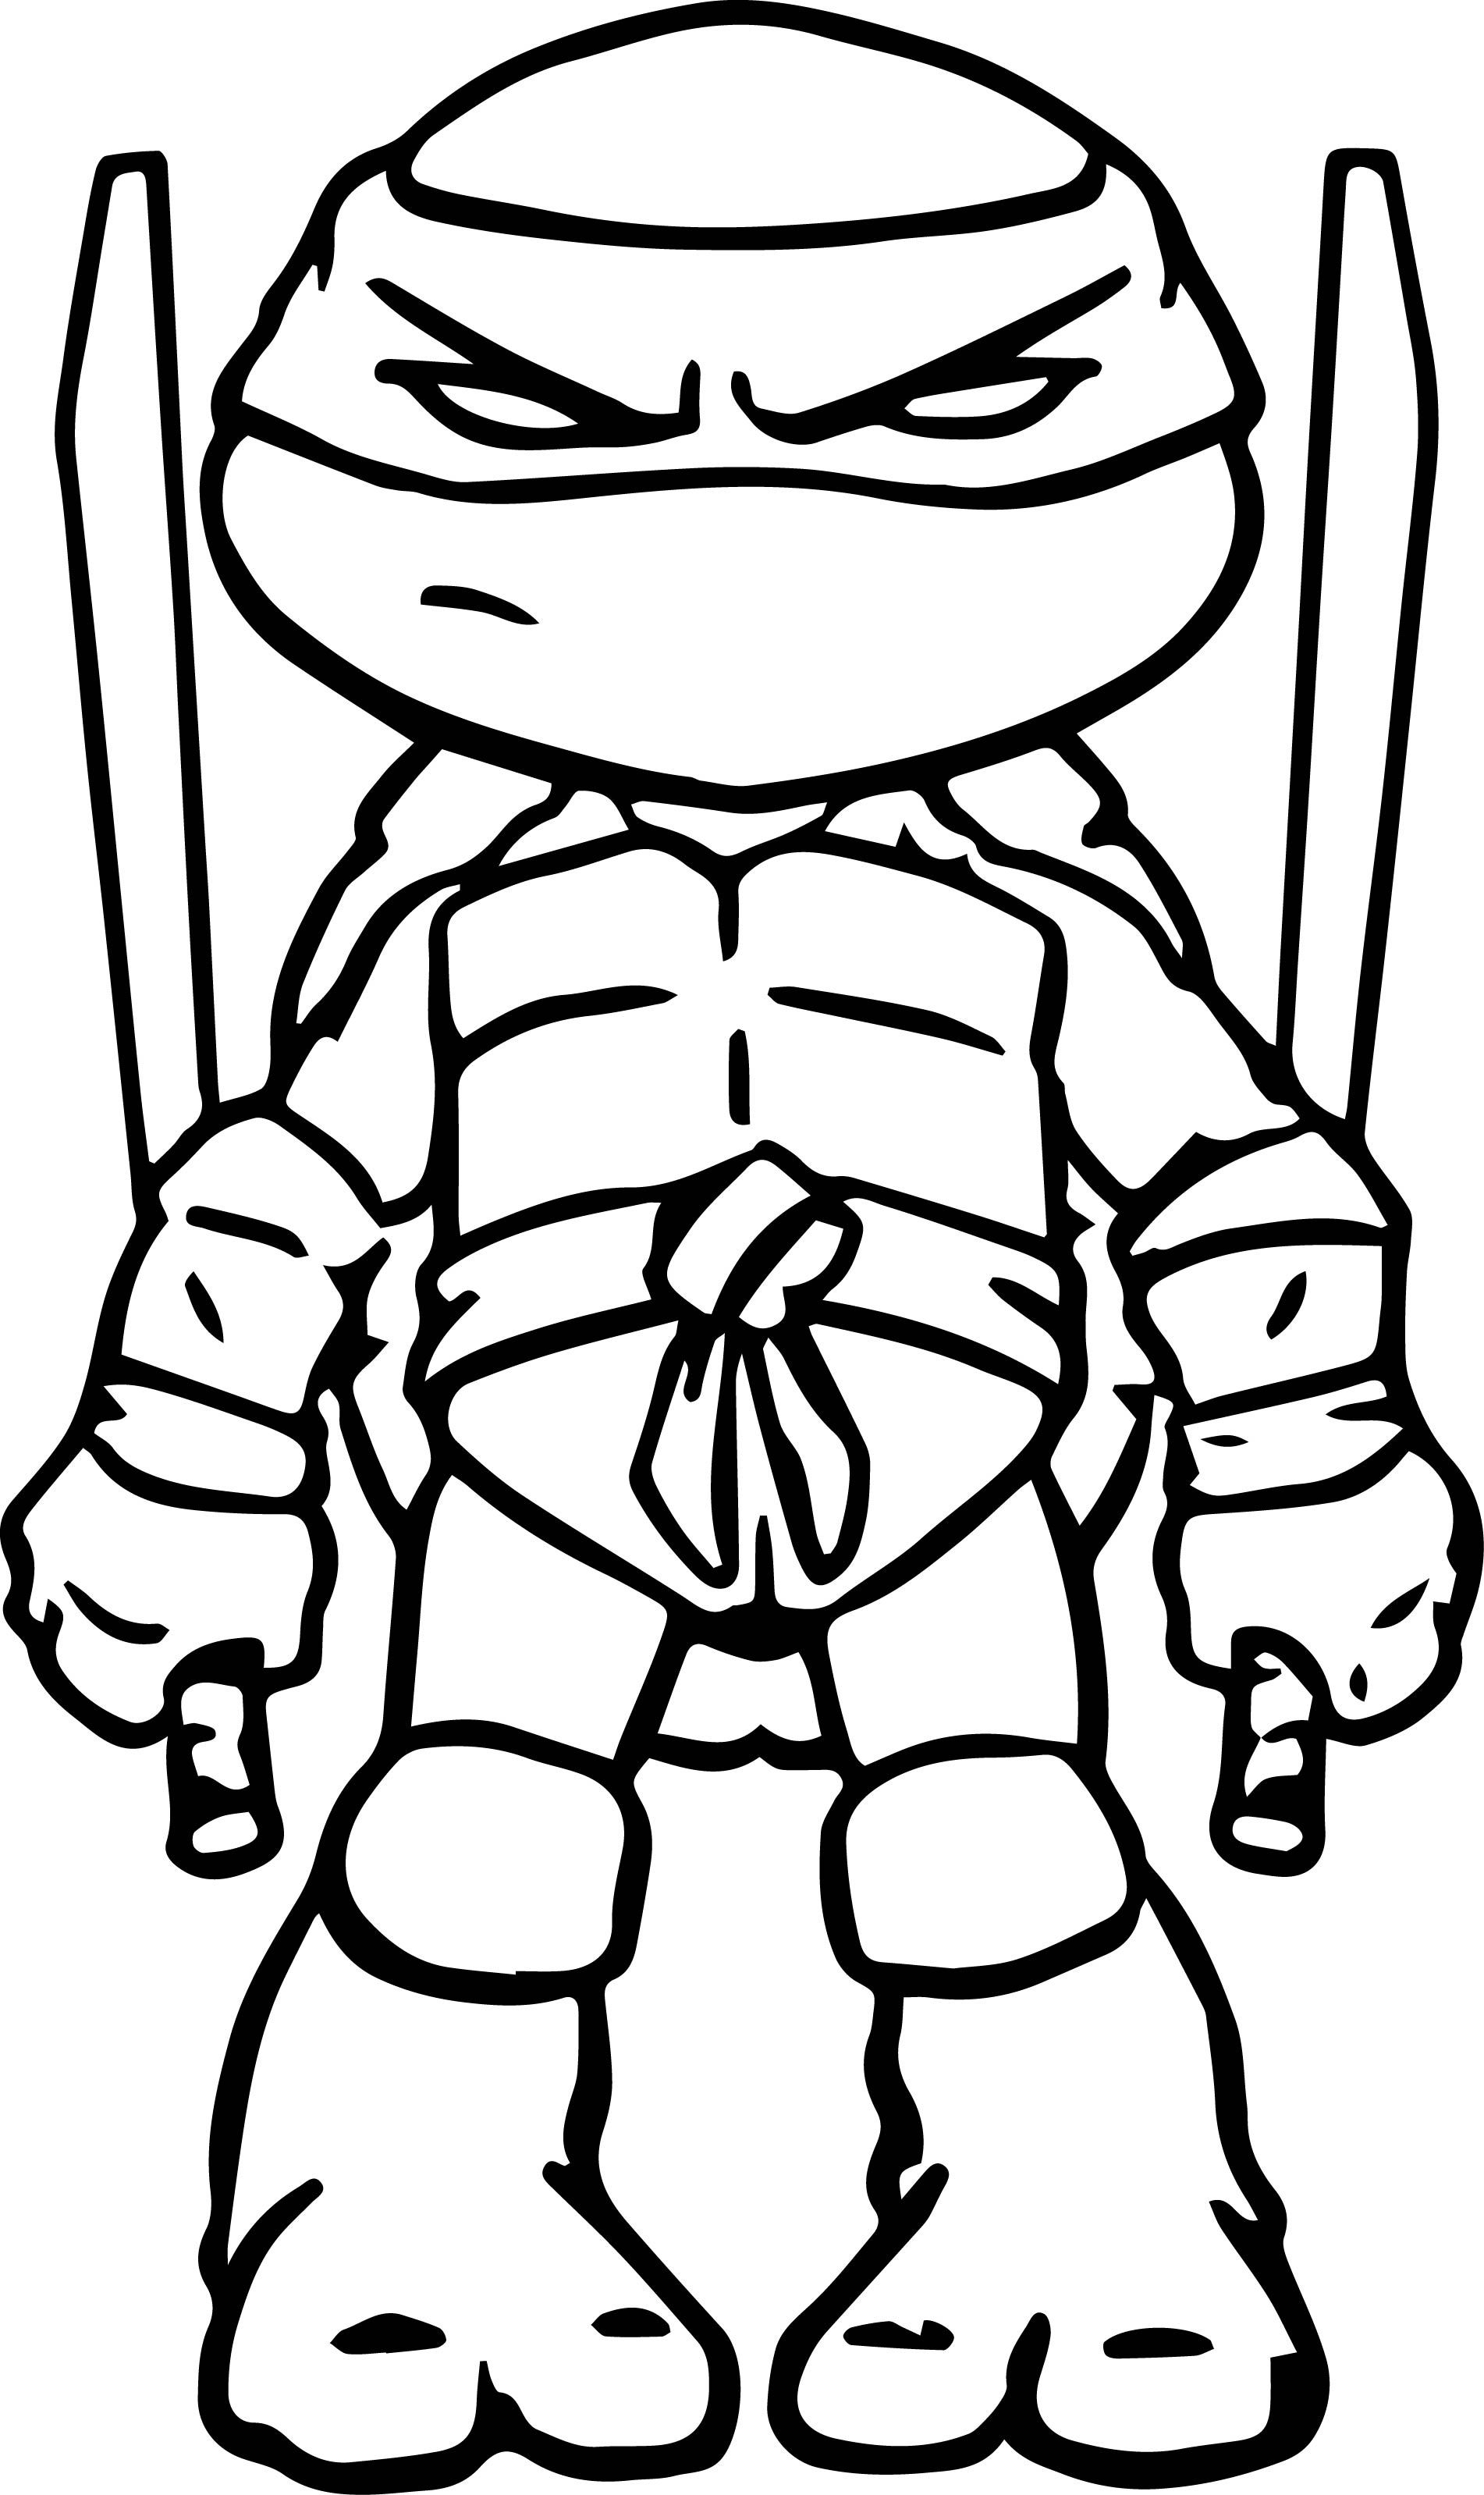 Ninja turtles art coloring page